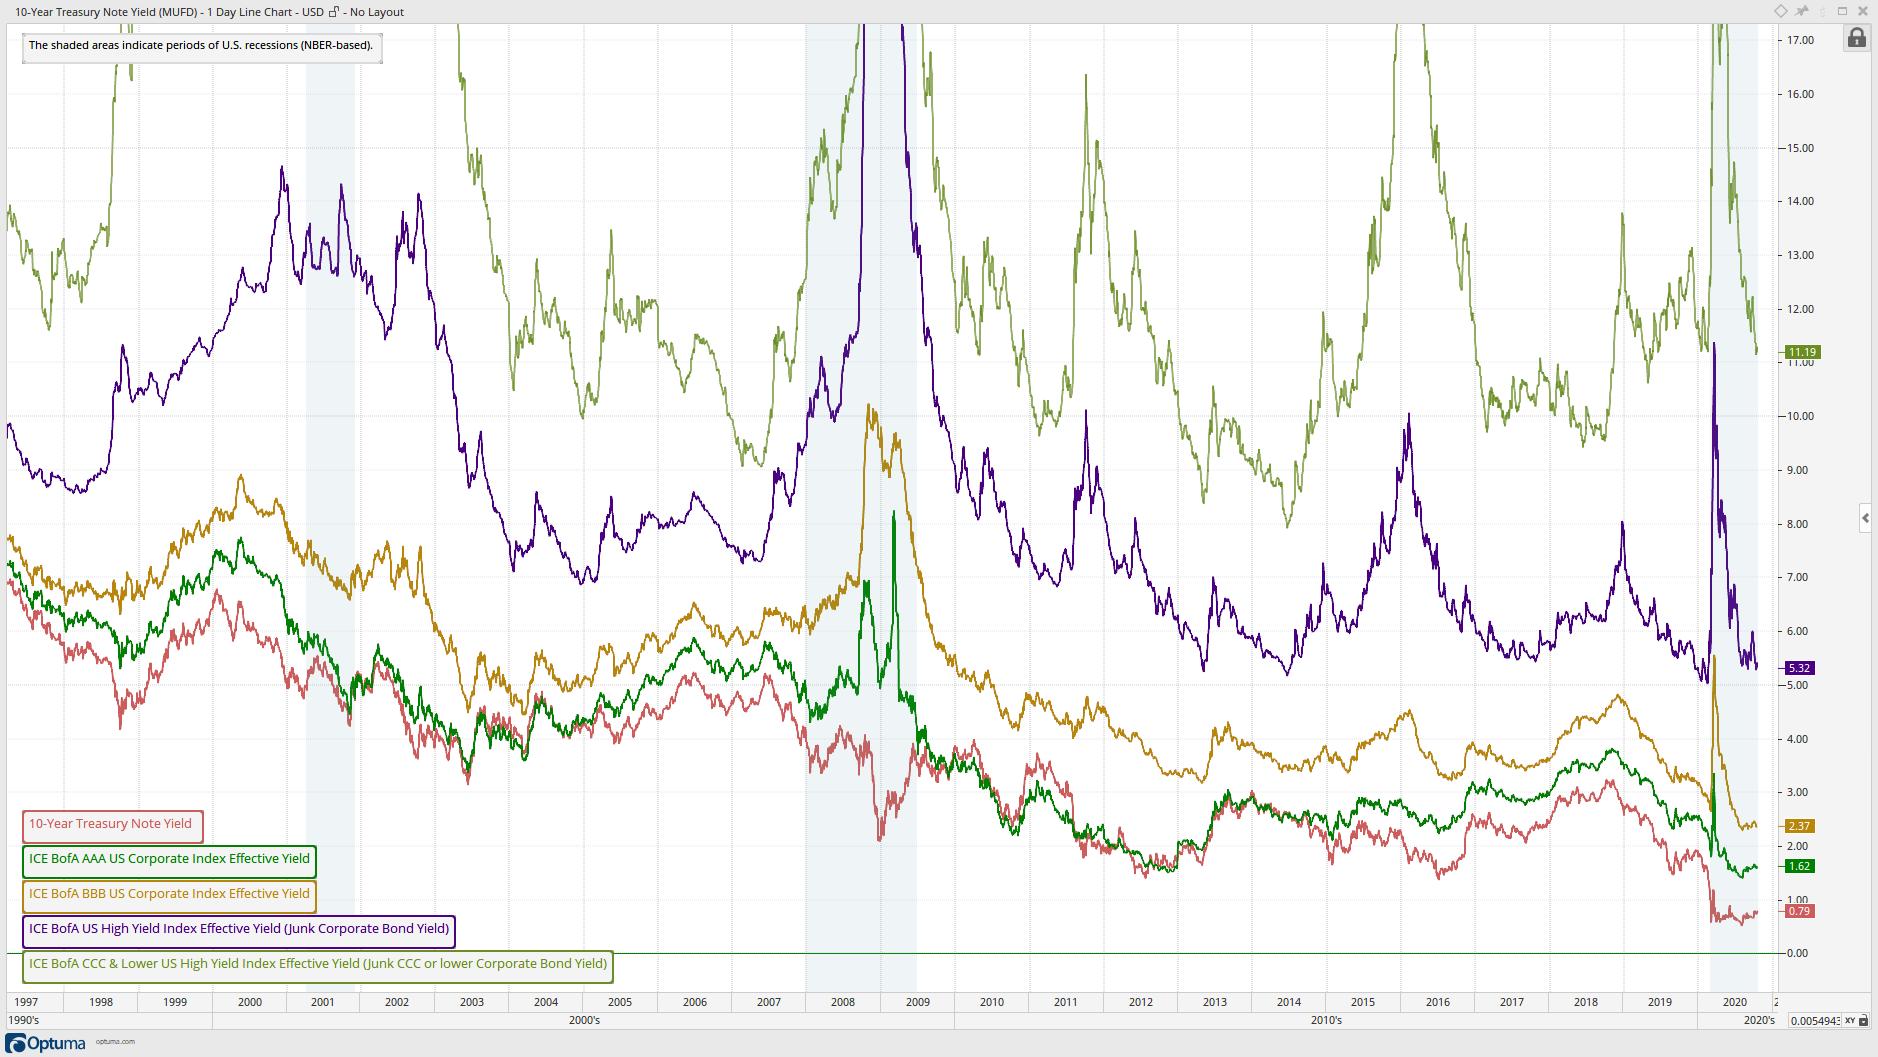 Major U.S. Corporate Bond Effective Yields